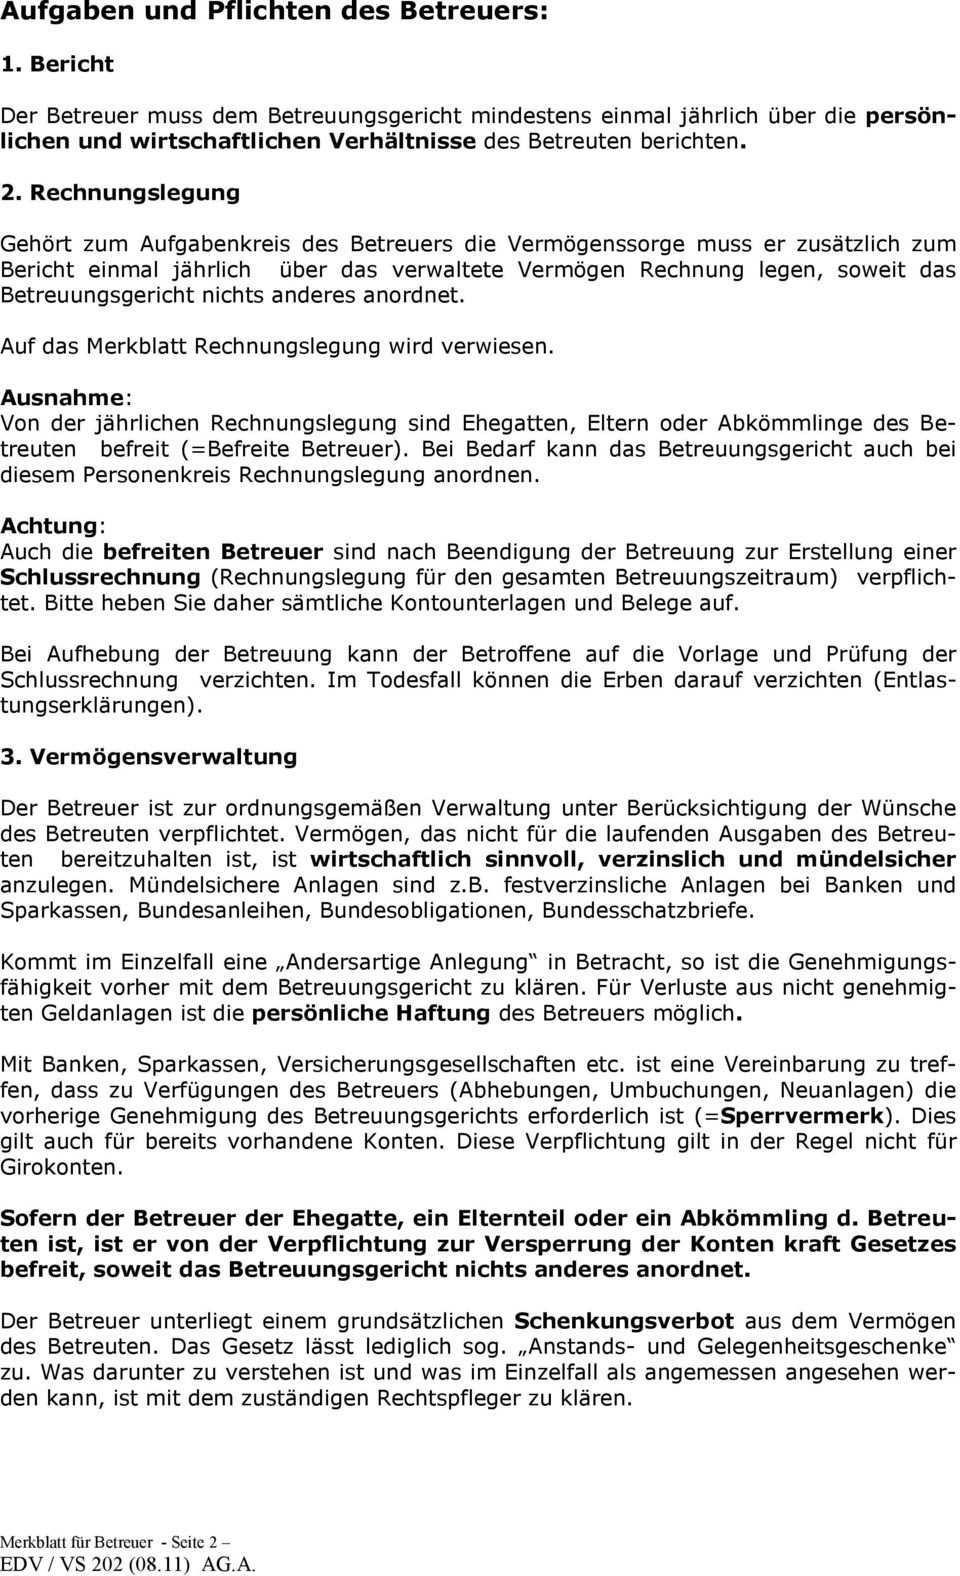 Rechtsstellung Des Betreuers Pdf Kostenfreier Download